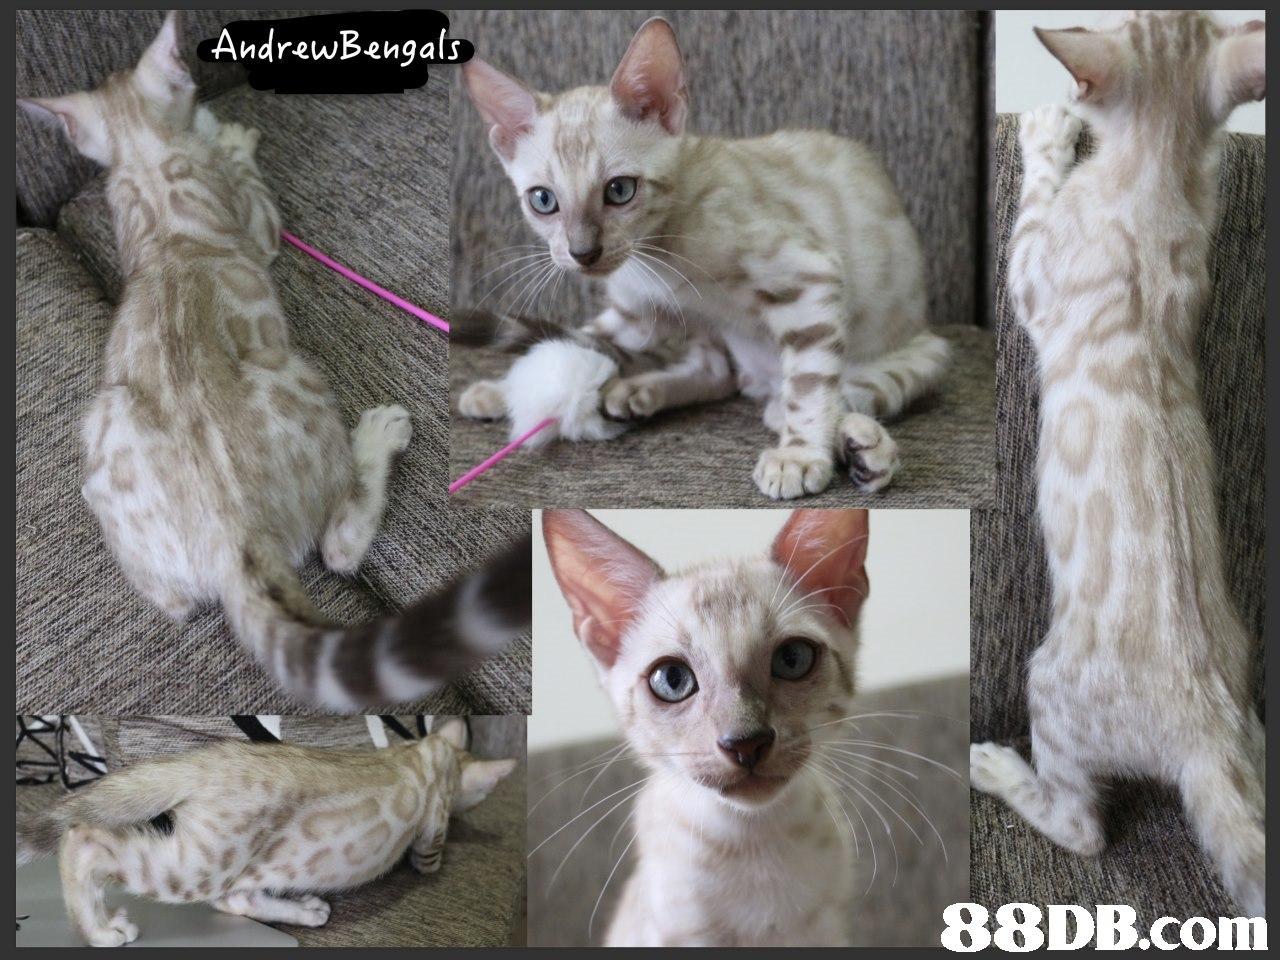 AndrewBengals,cat,small to medium sized cats,cat like mammal,fauna,devon rex